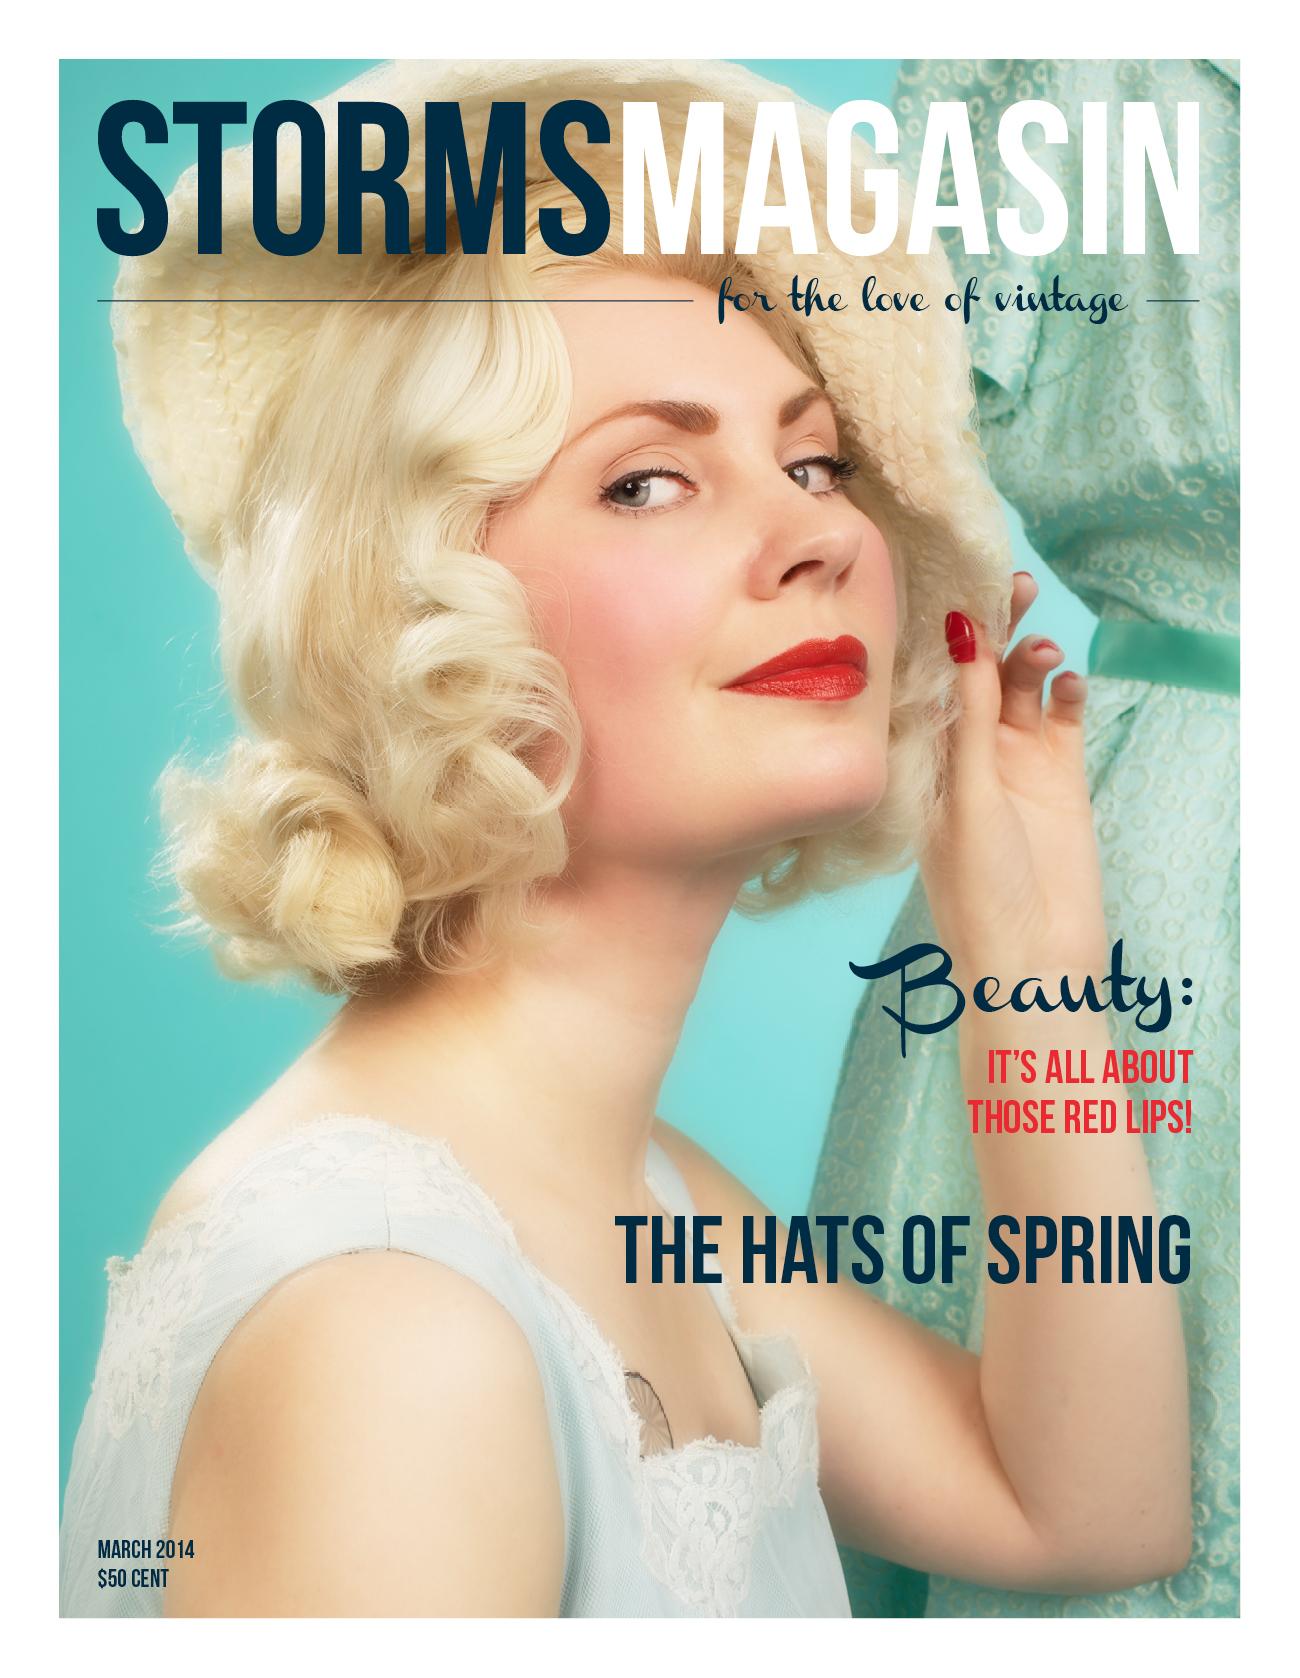 stormsmagasin_postkort_web3